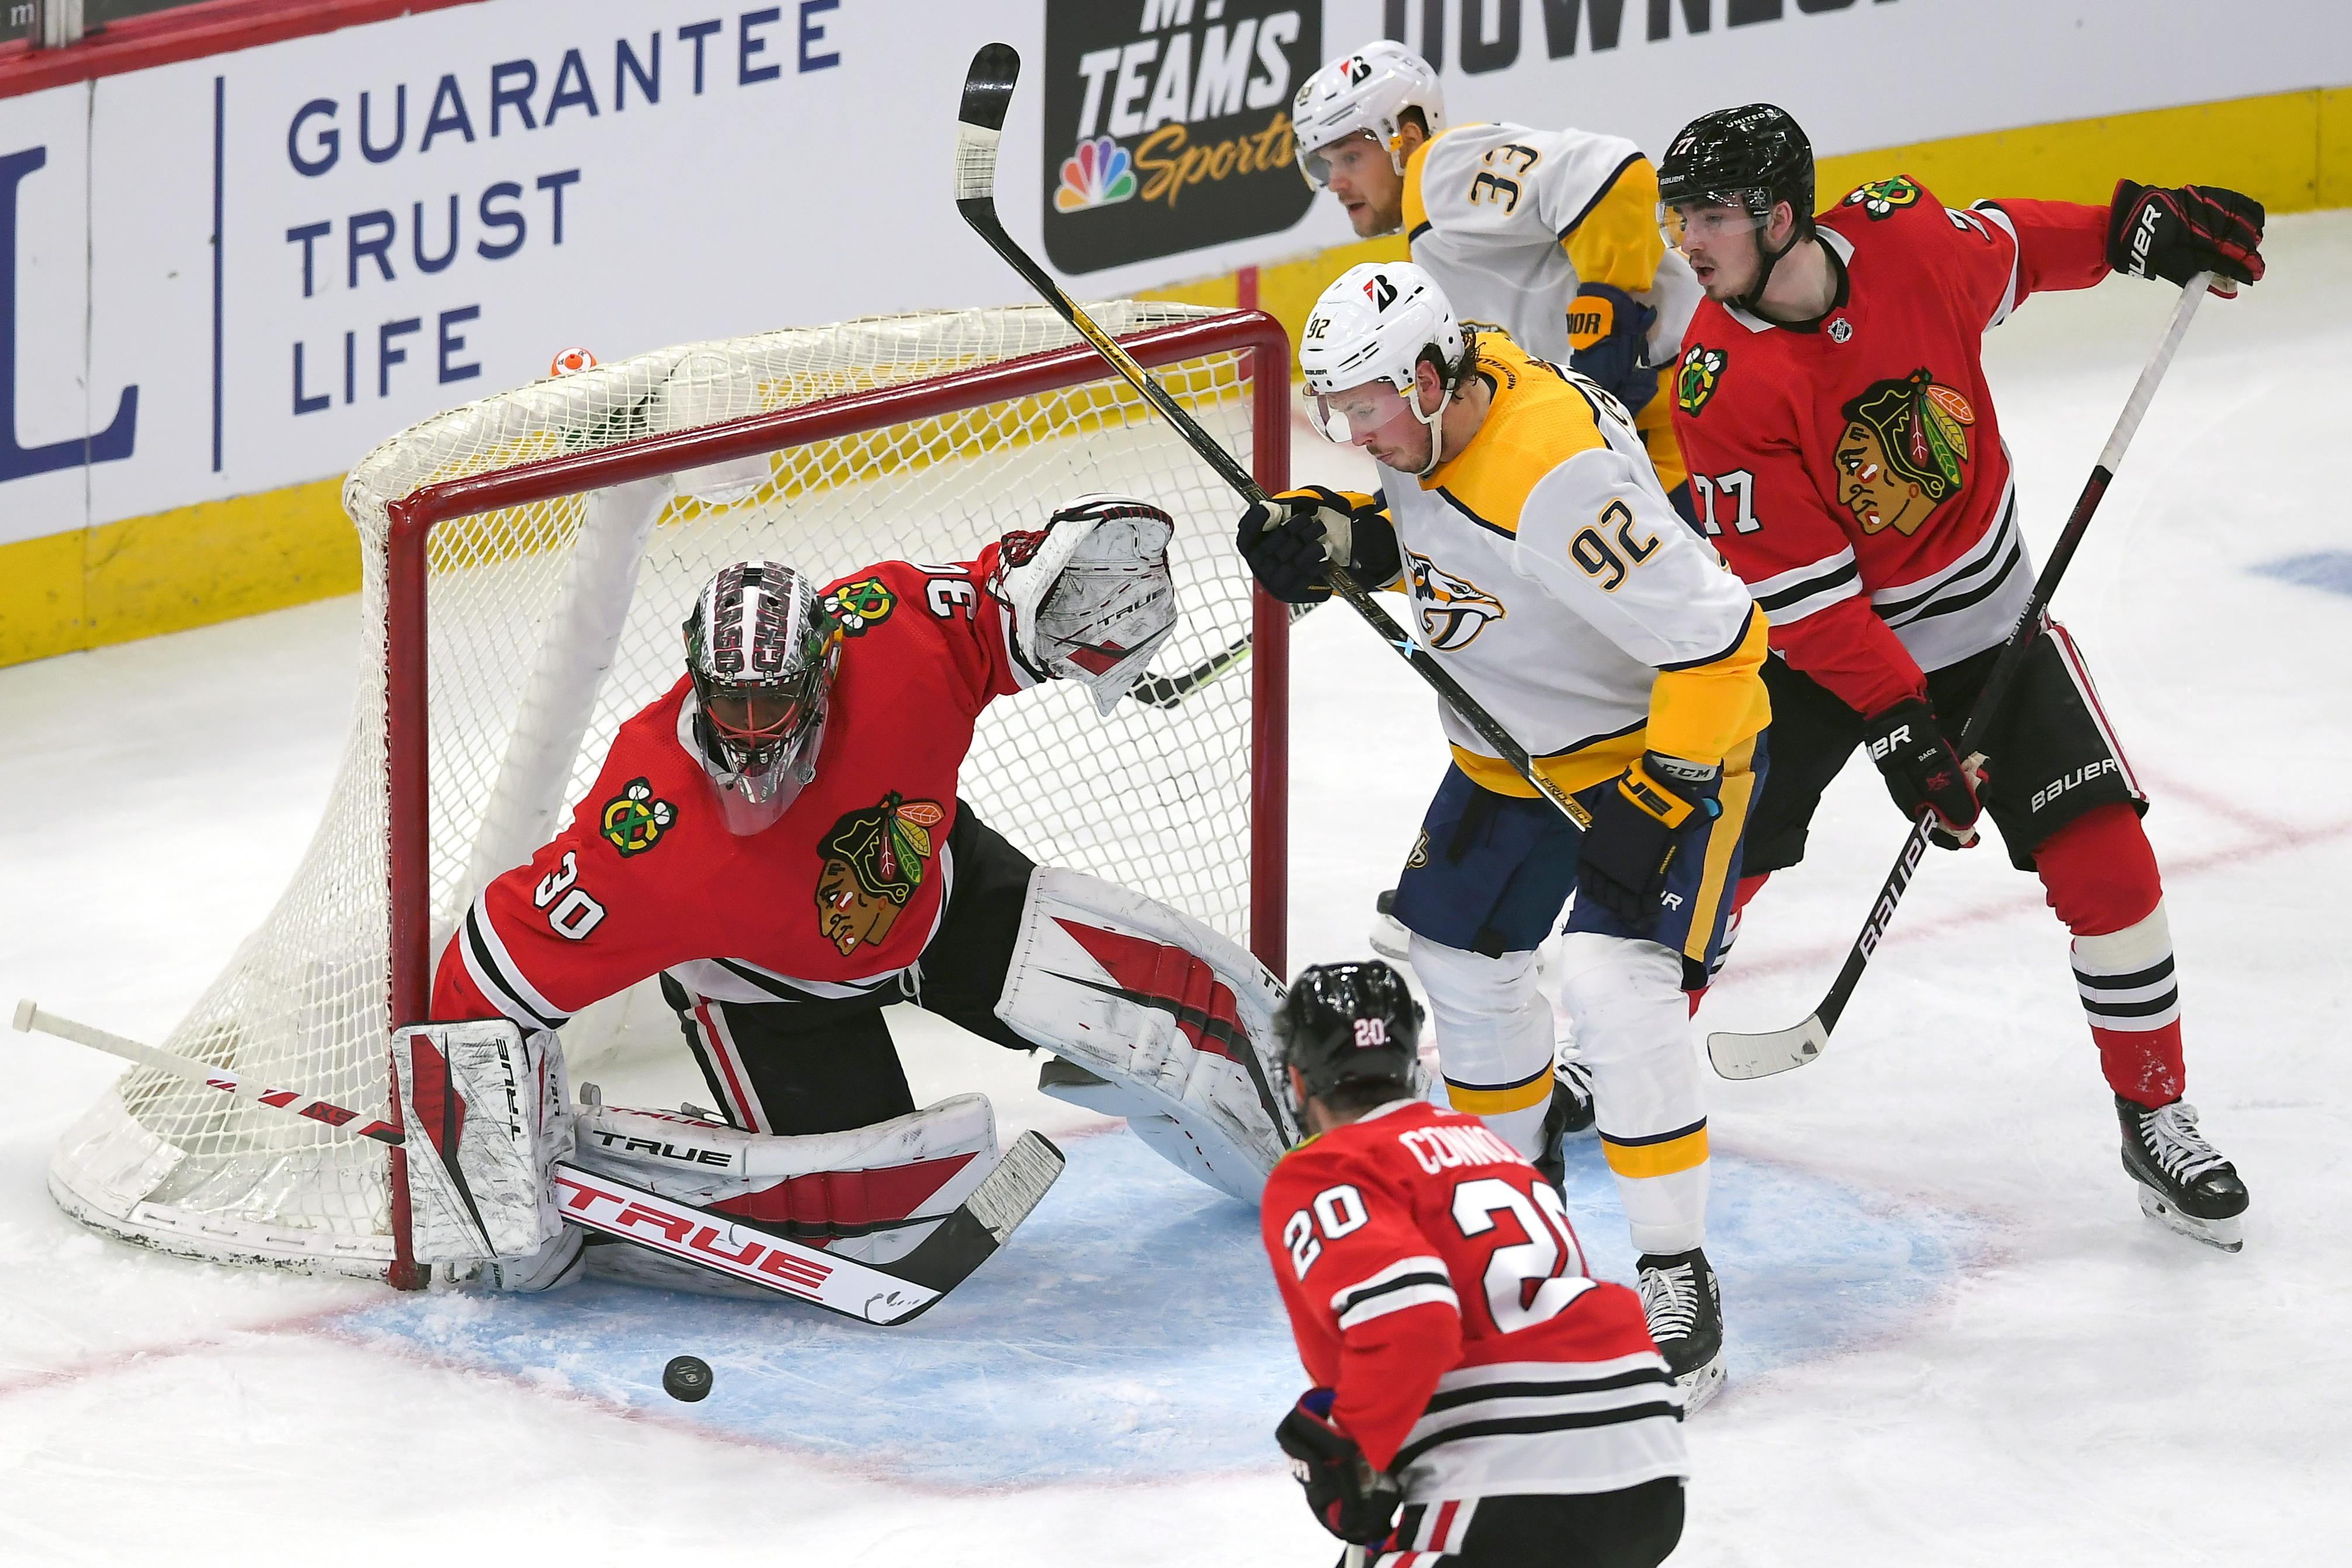 NHL: APR 23 Predators at Blackhawks